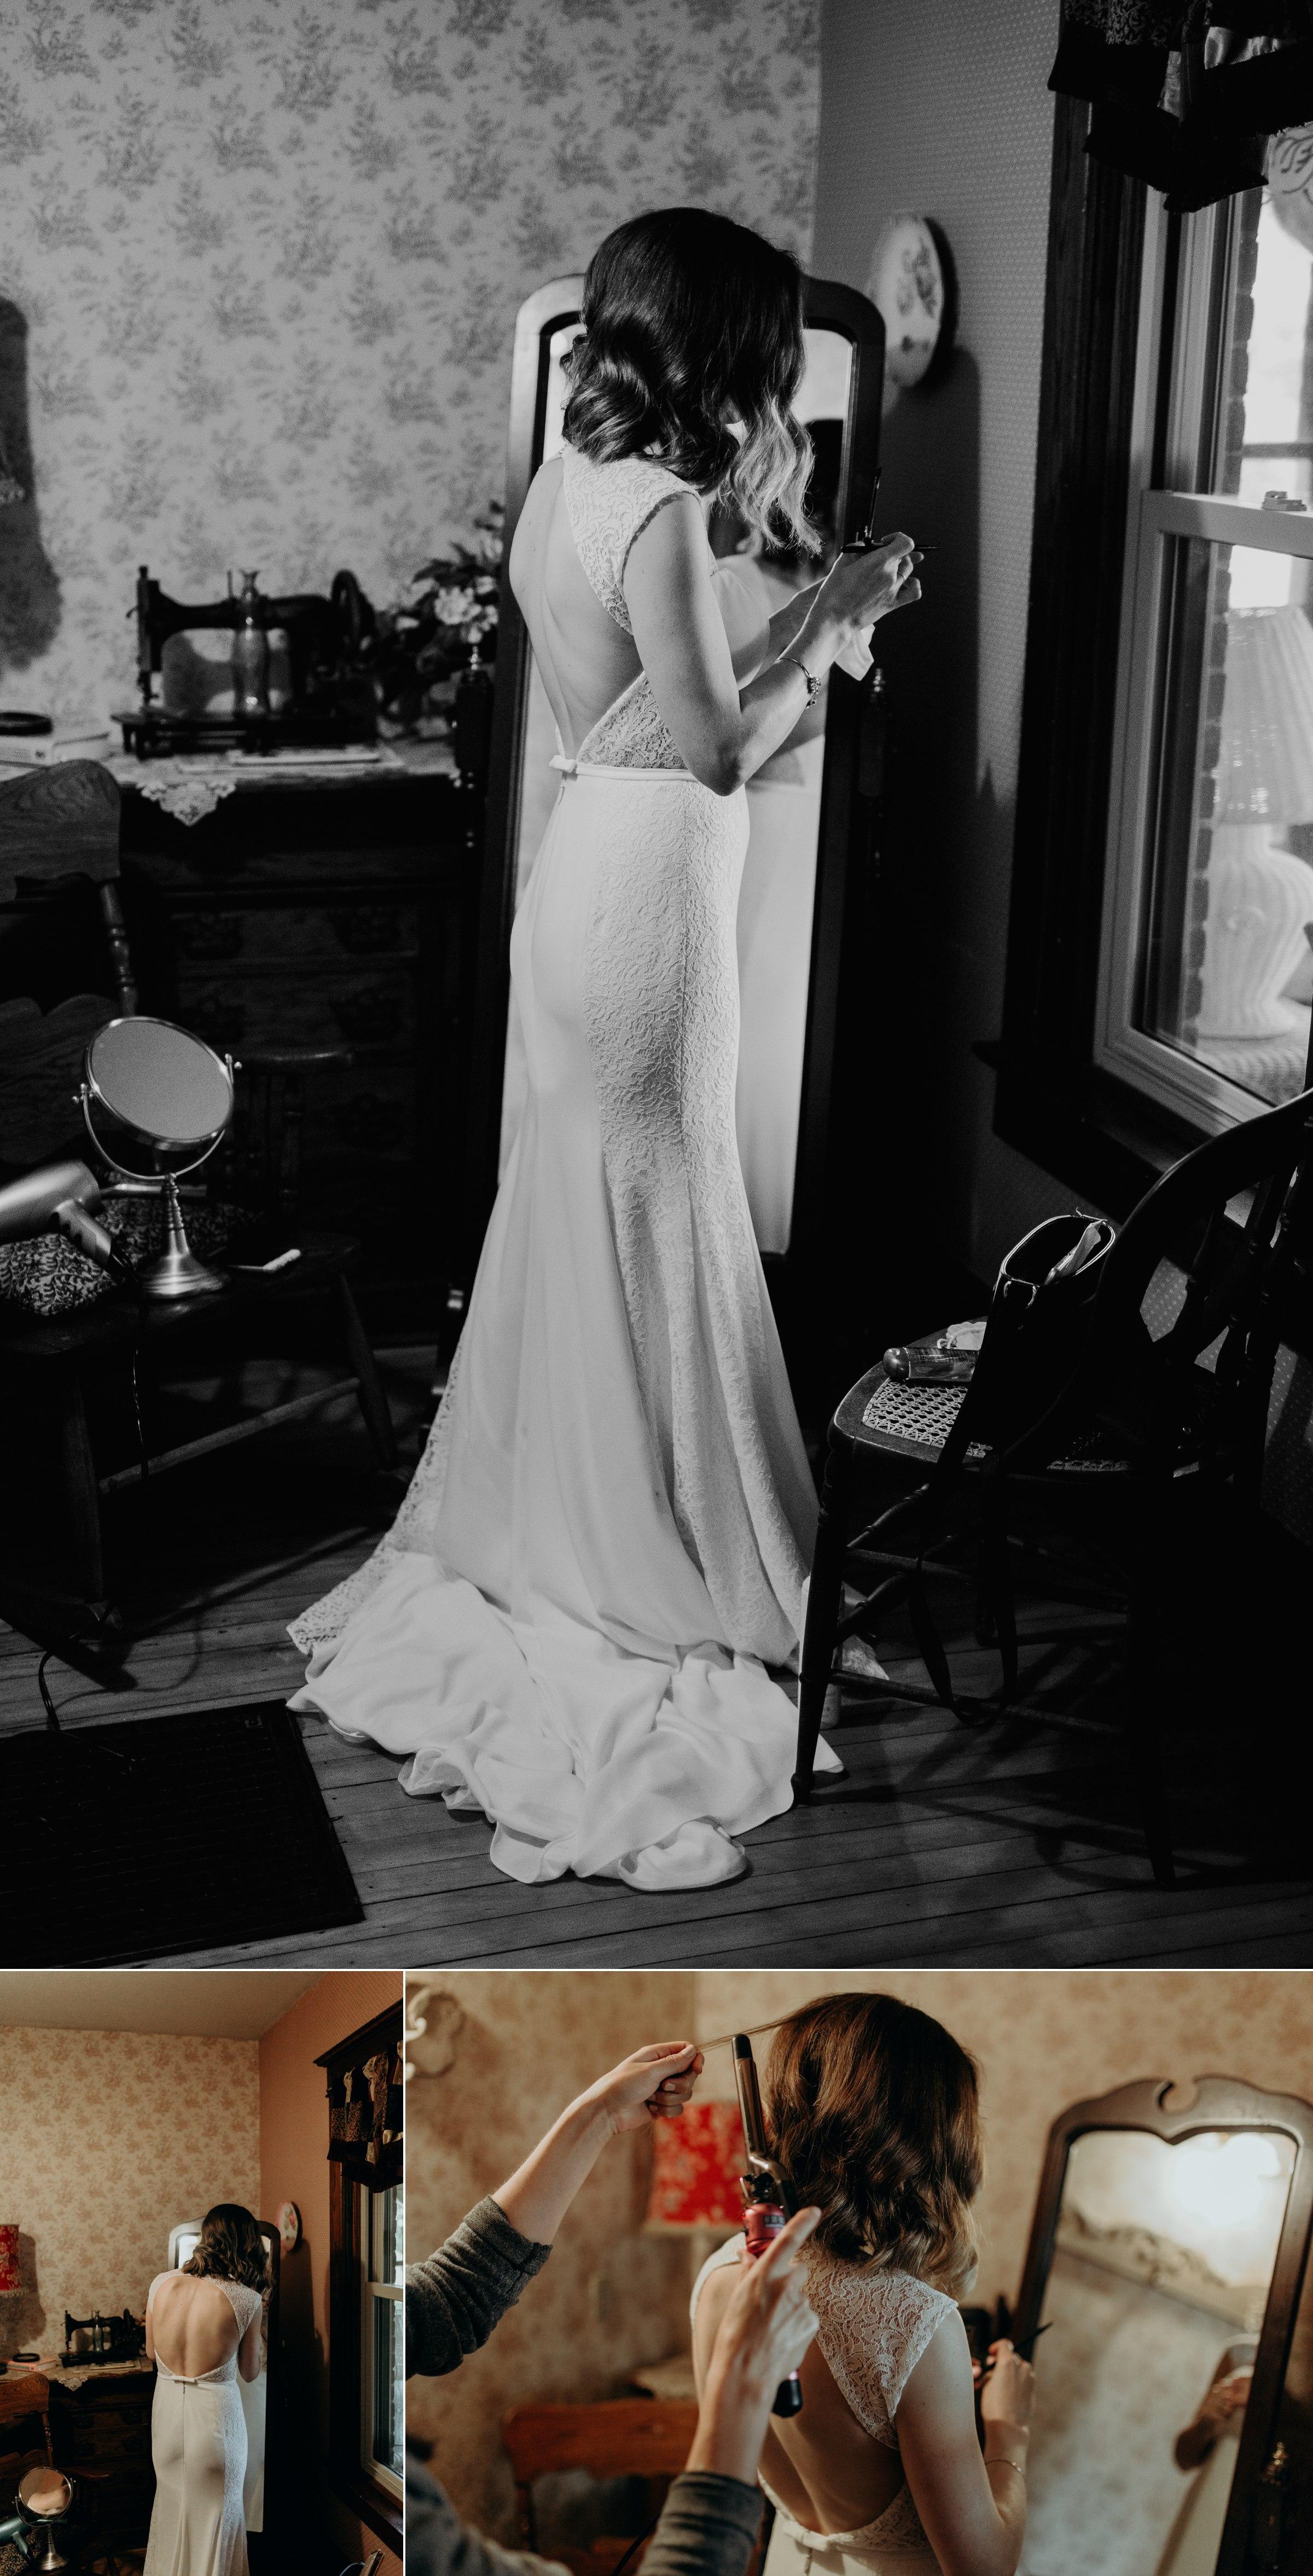 caroline and taylor minneapolis minnesota texas austin dallas houston wedding elopement destination intimate adventurous couple best photographer_0207.jpg